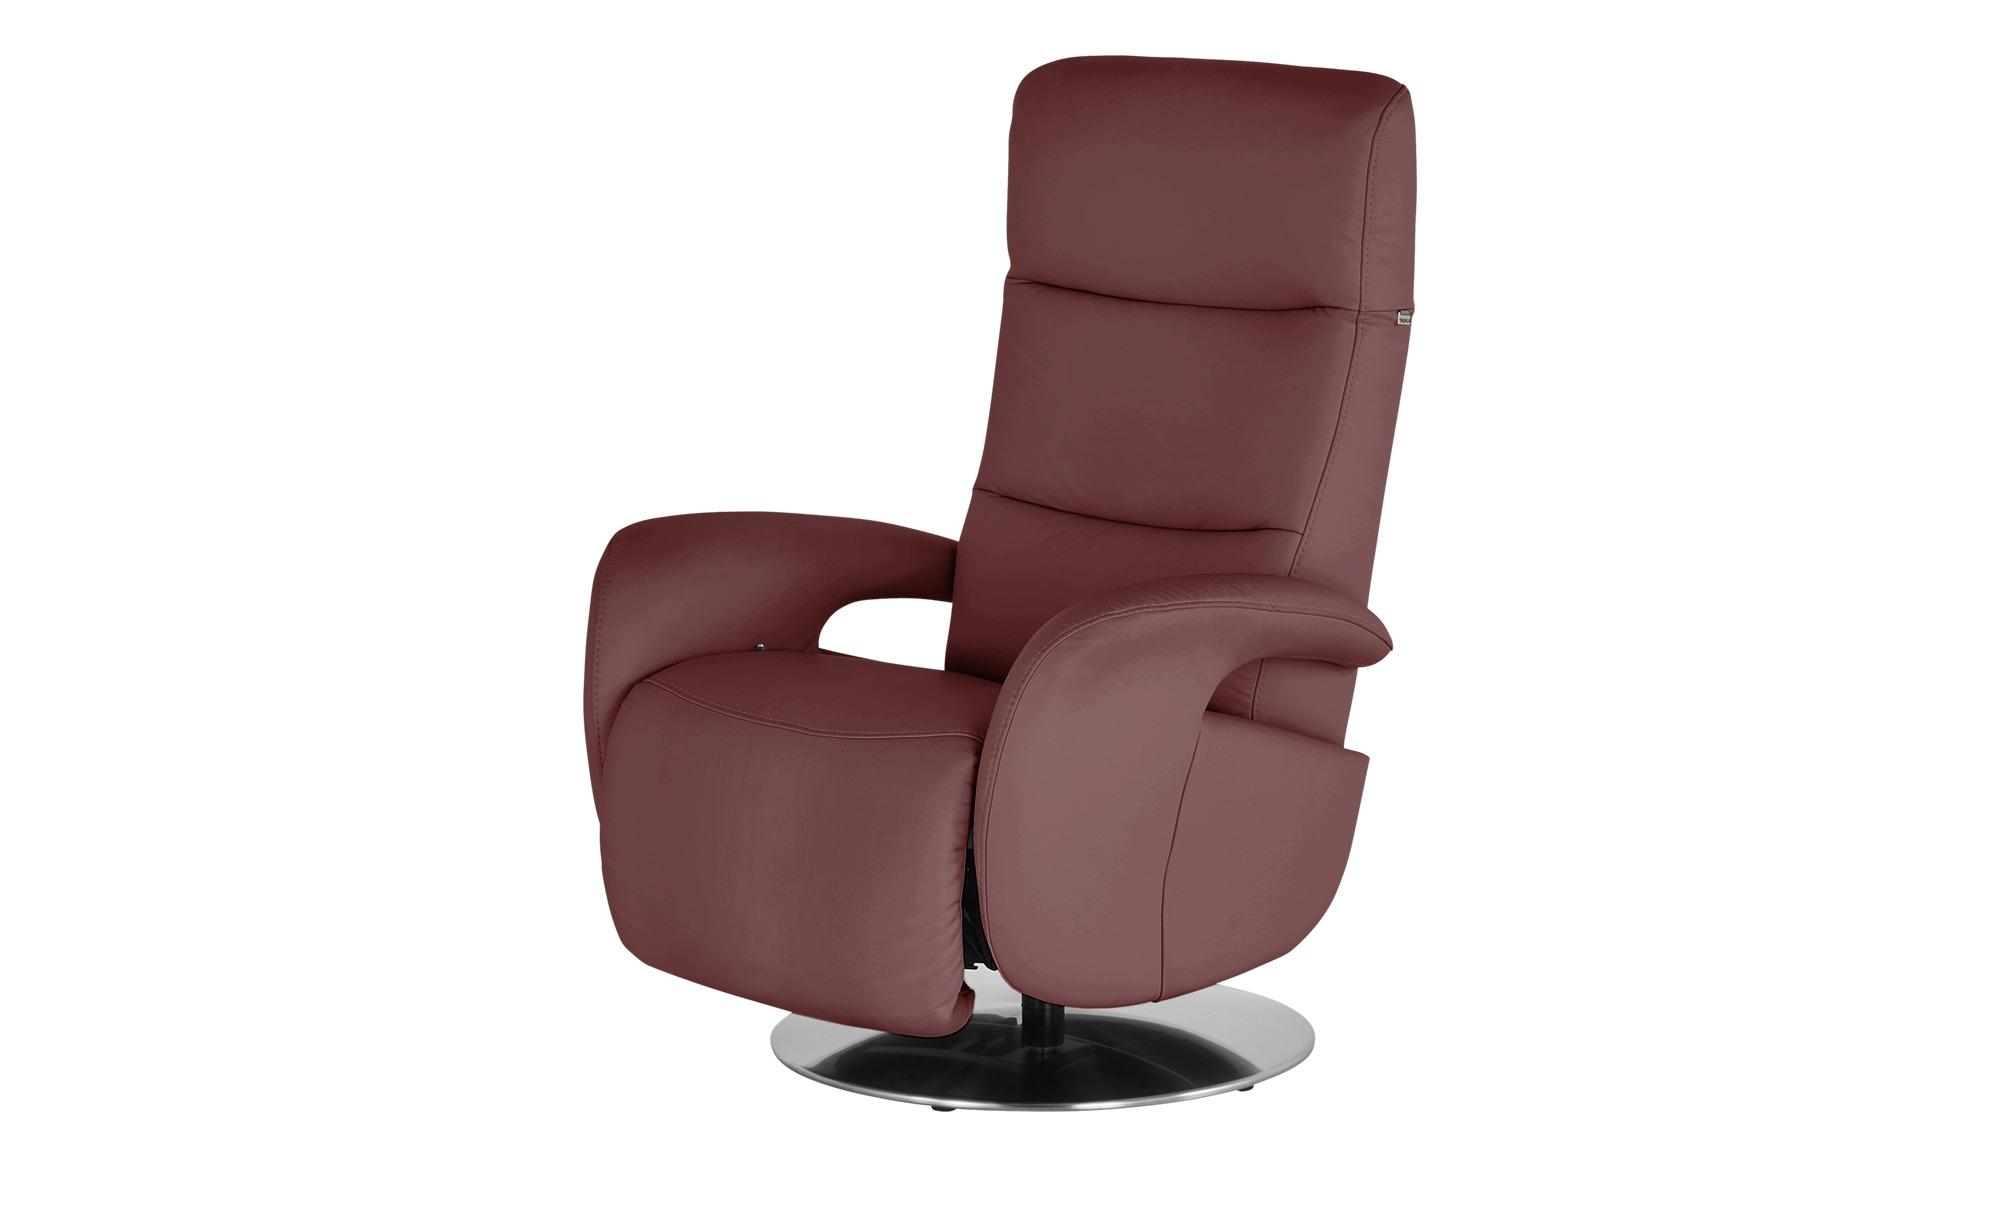 Hukla Relaxsessel  Andy ¦ lila/violett ¦ Maße (cm): B: 79 H: 110 T: 85 Polstermöbel > Sessel > Fernsehsessel - Höffner